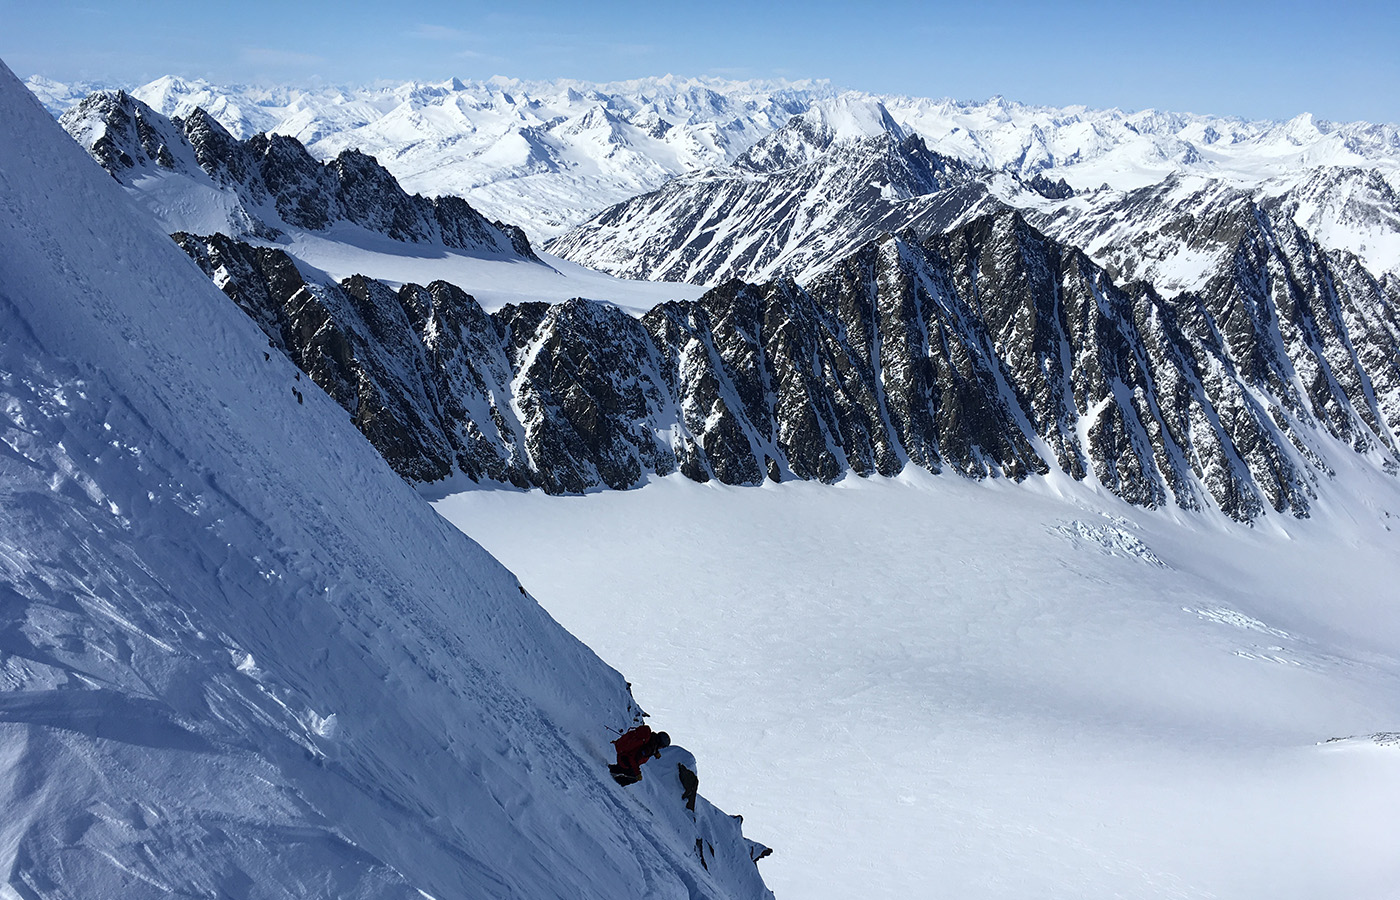 Skiing the steeps in Valdez AK